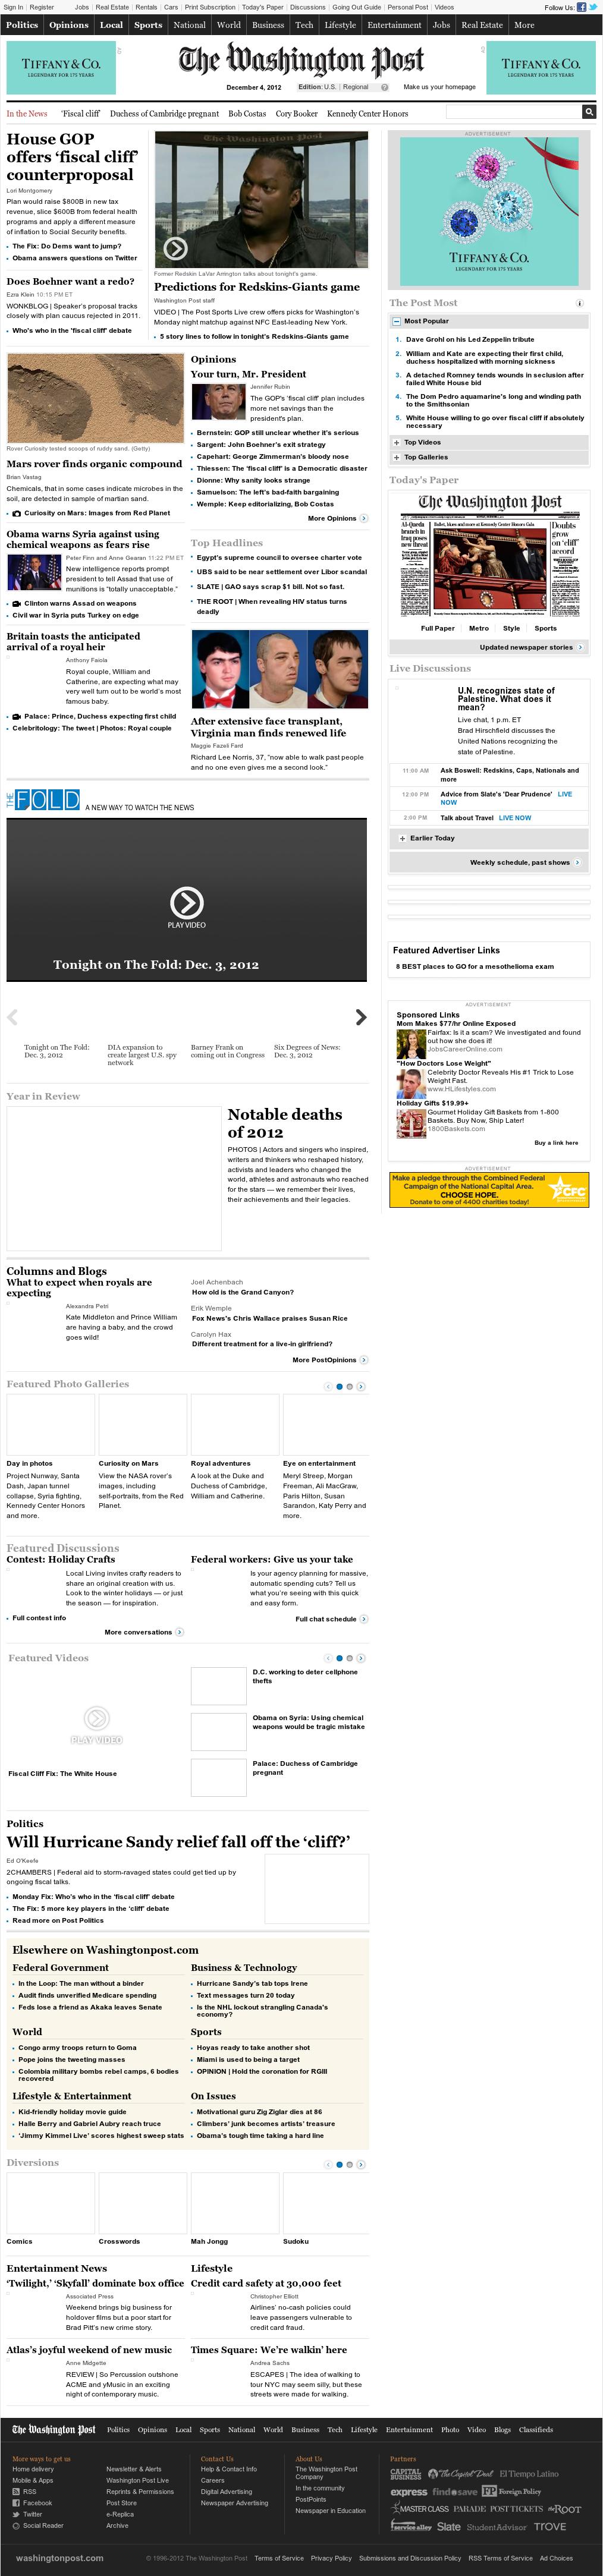 The Washington Post at Tuesday Dec. 4, 2012, 12:37 a.m. UTC